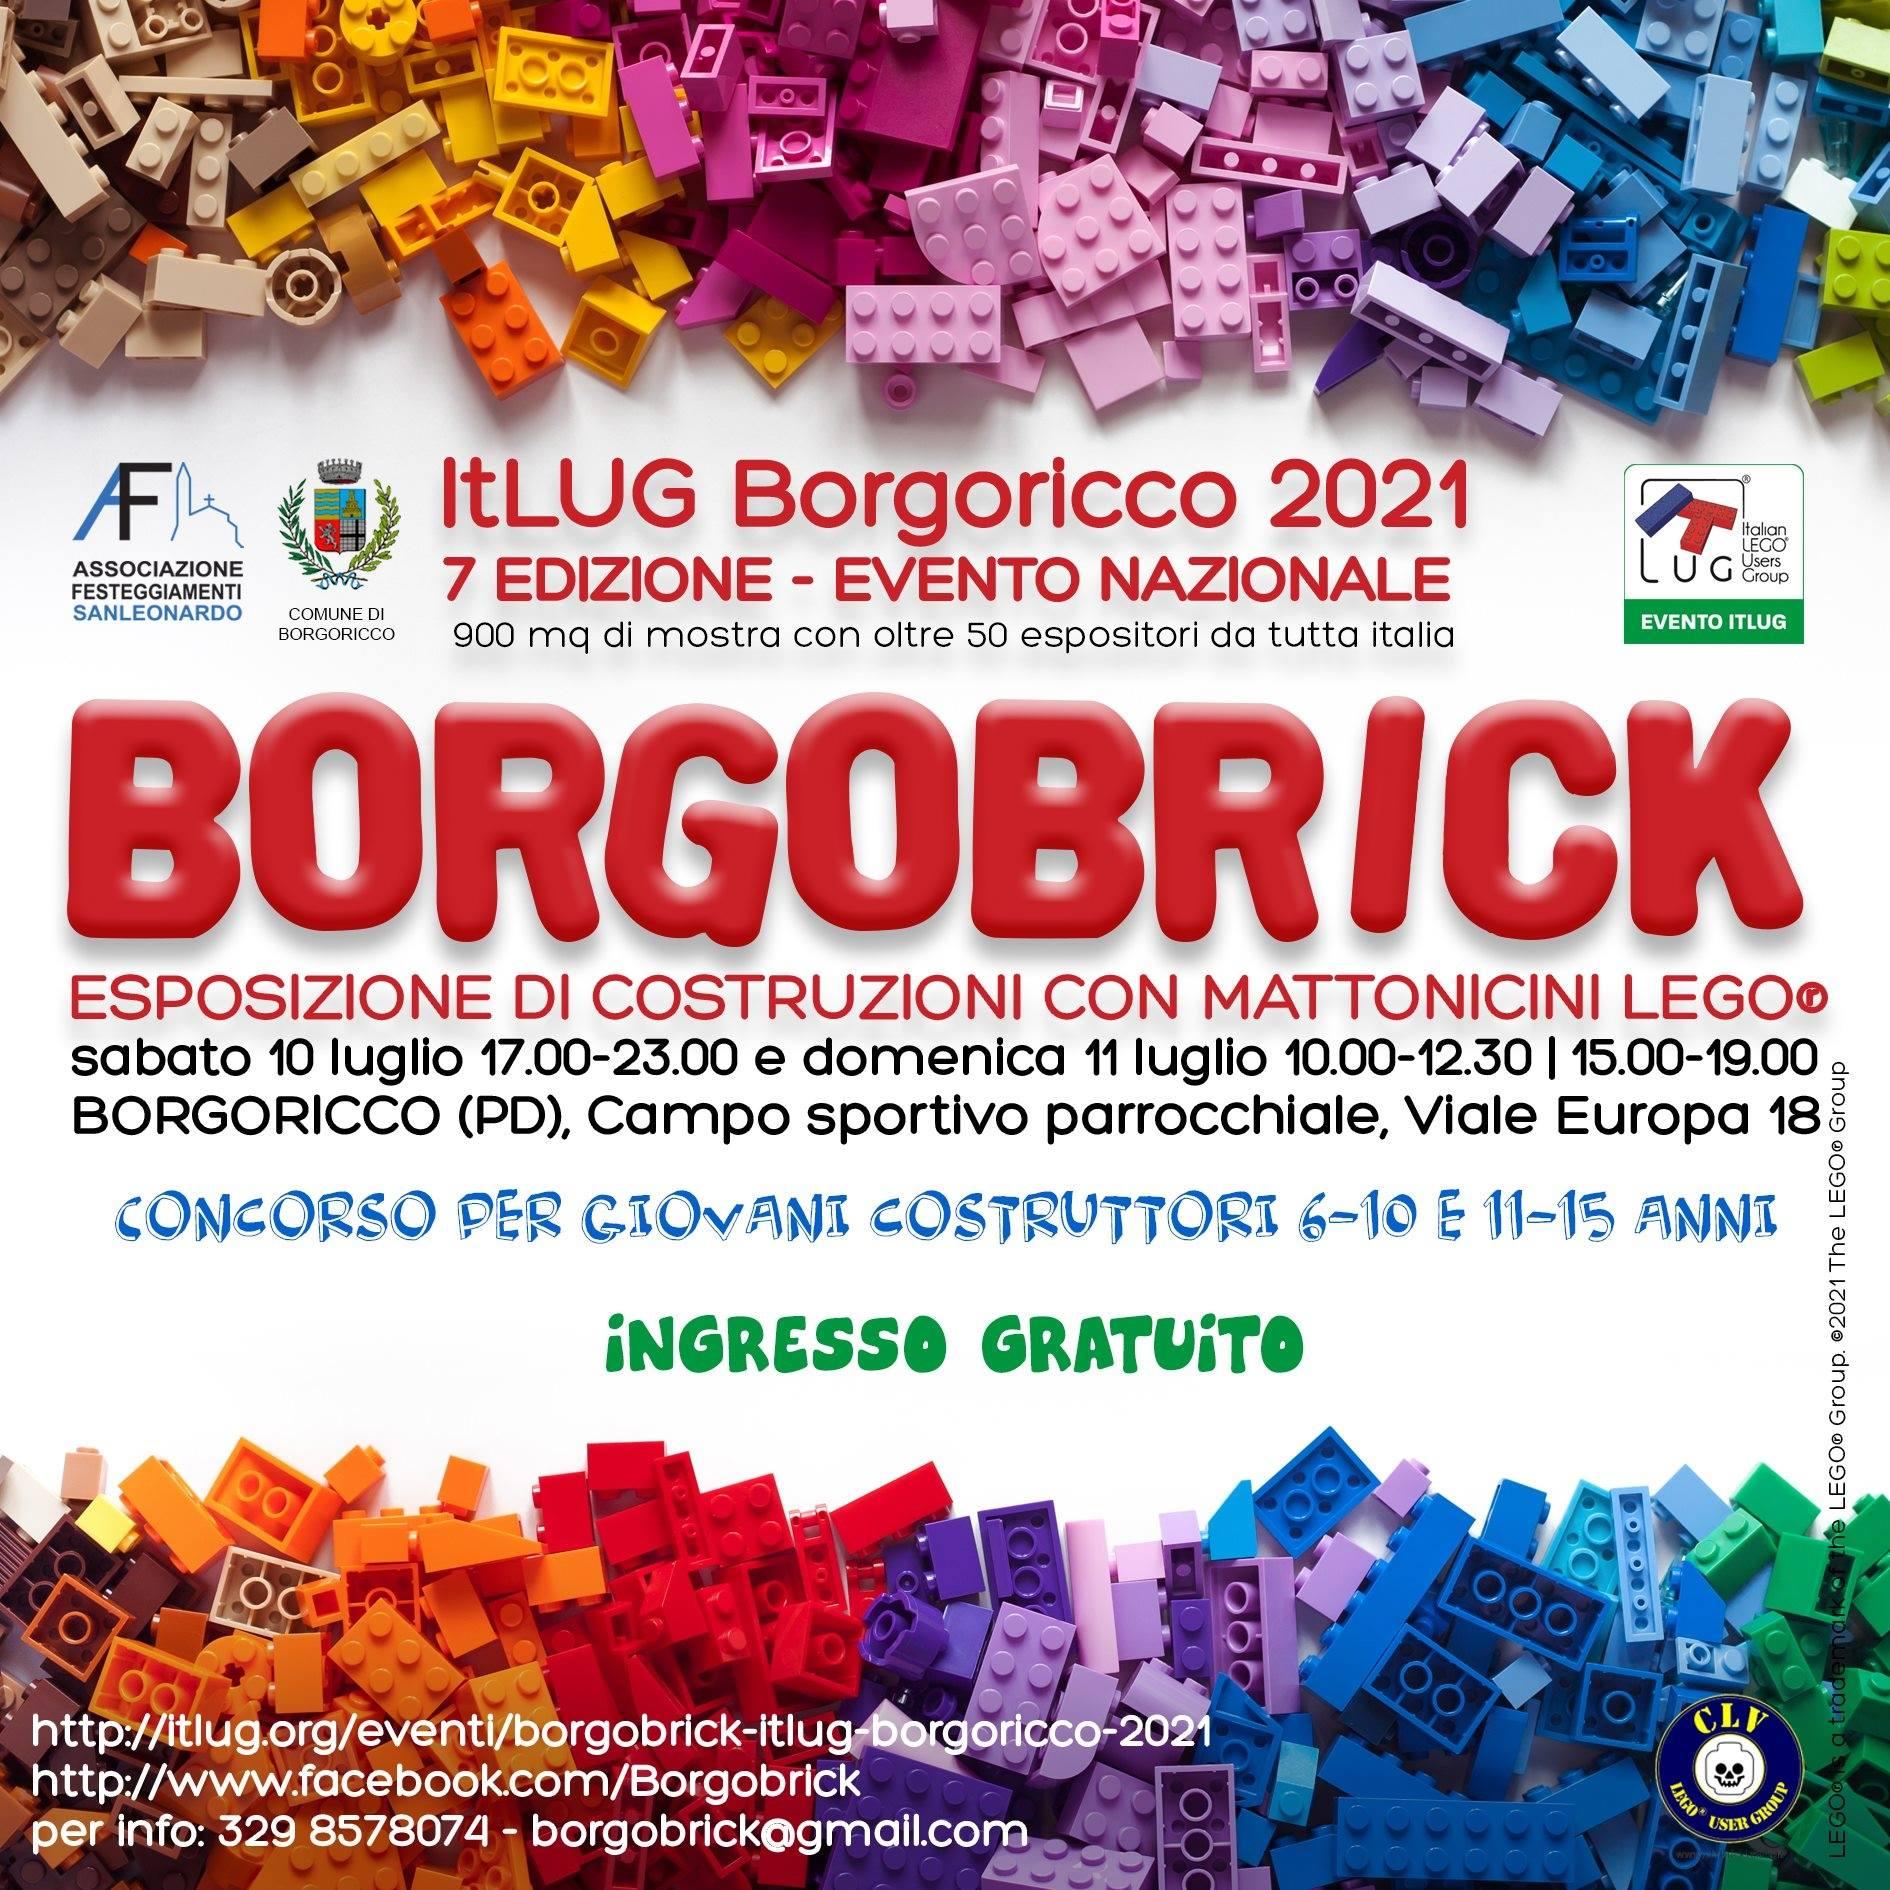 Borgobrick 2021 – Reportage Fotografico